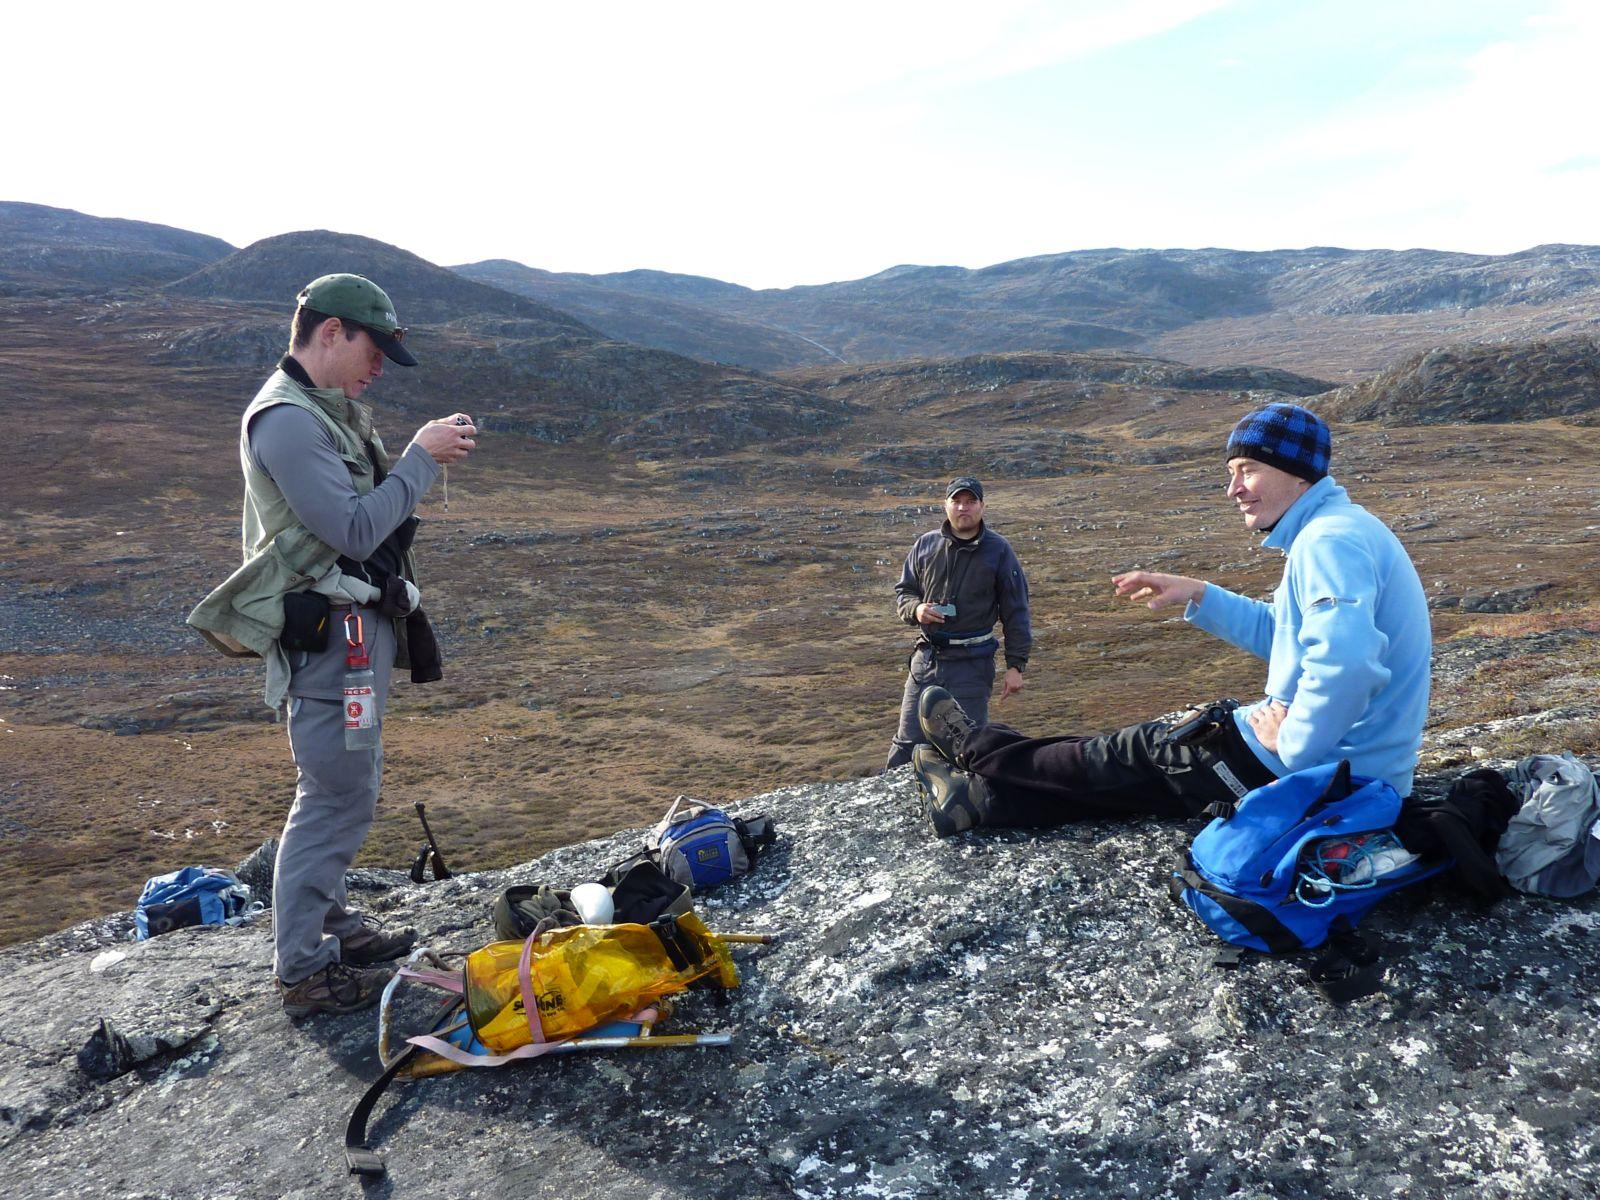 2010-09-25-1114_-_Jesper Eugenius Labansen; John Telling; Svend Sværd